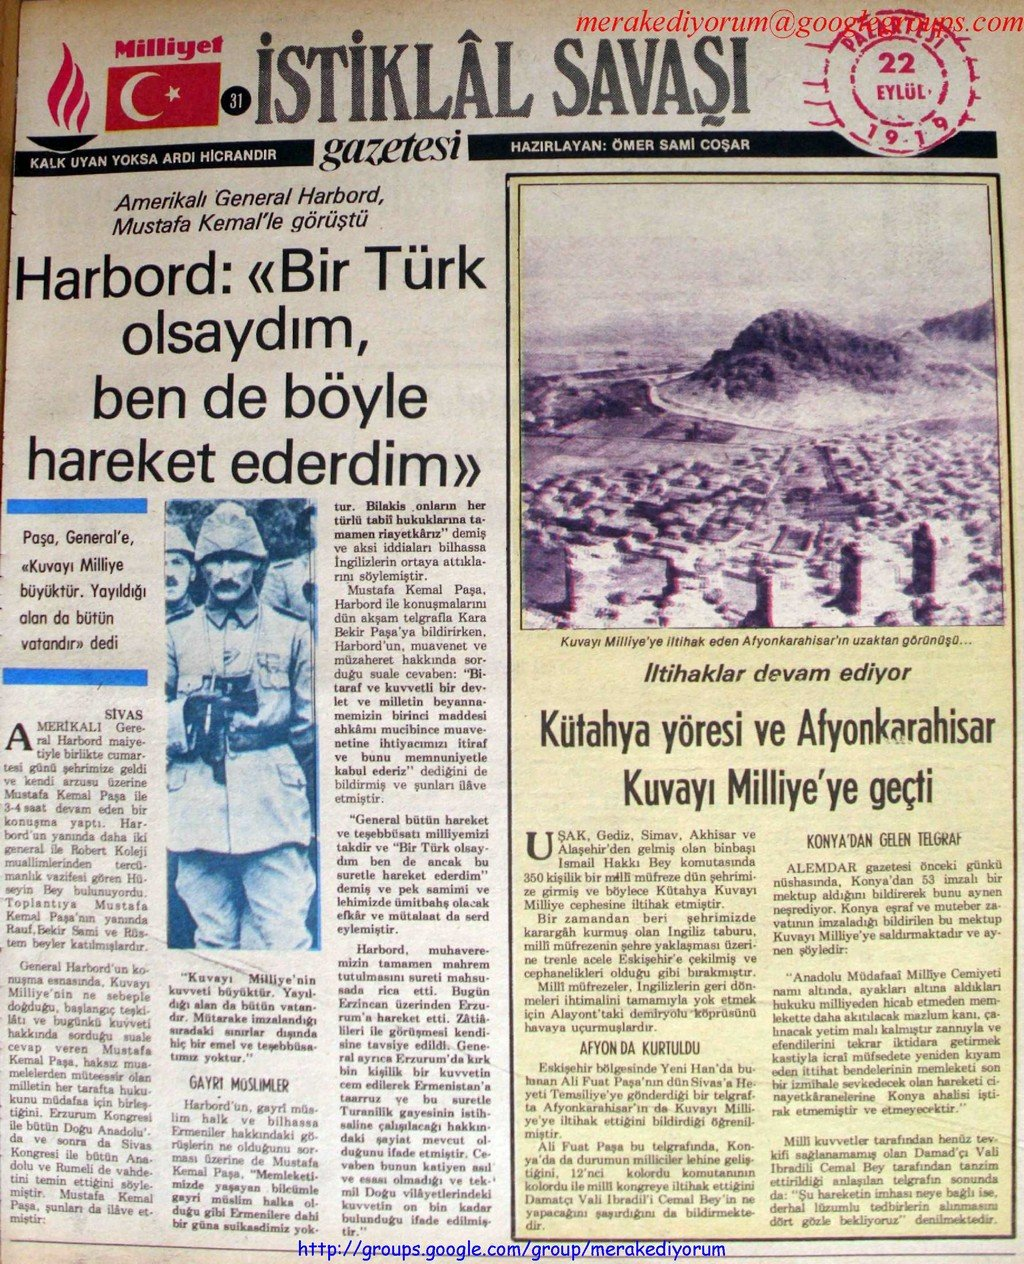 istiklal savaşı gazetesi - 22 eylül 1919